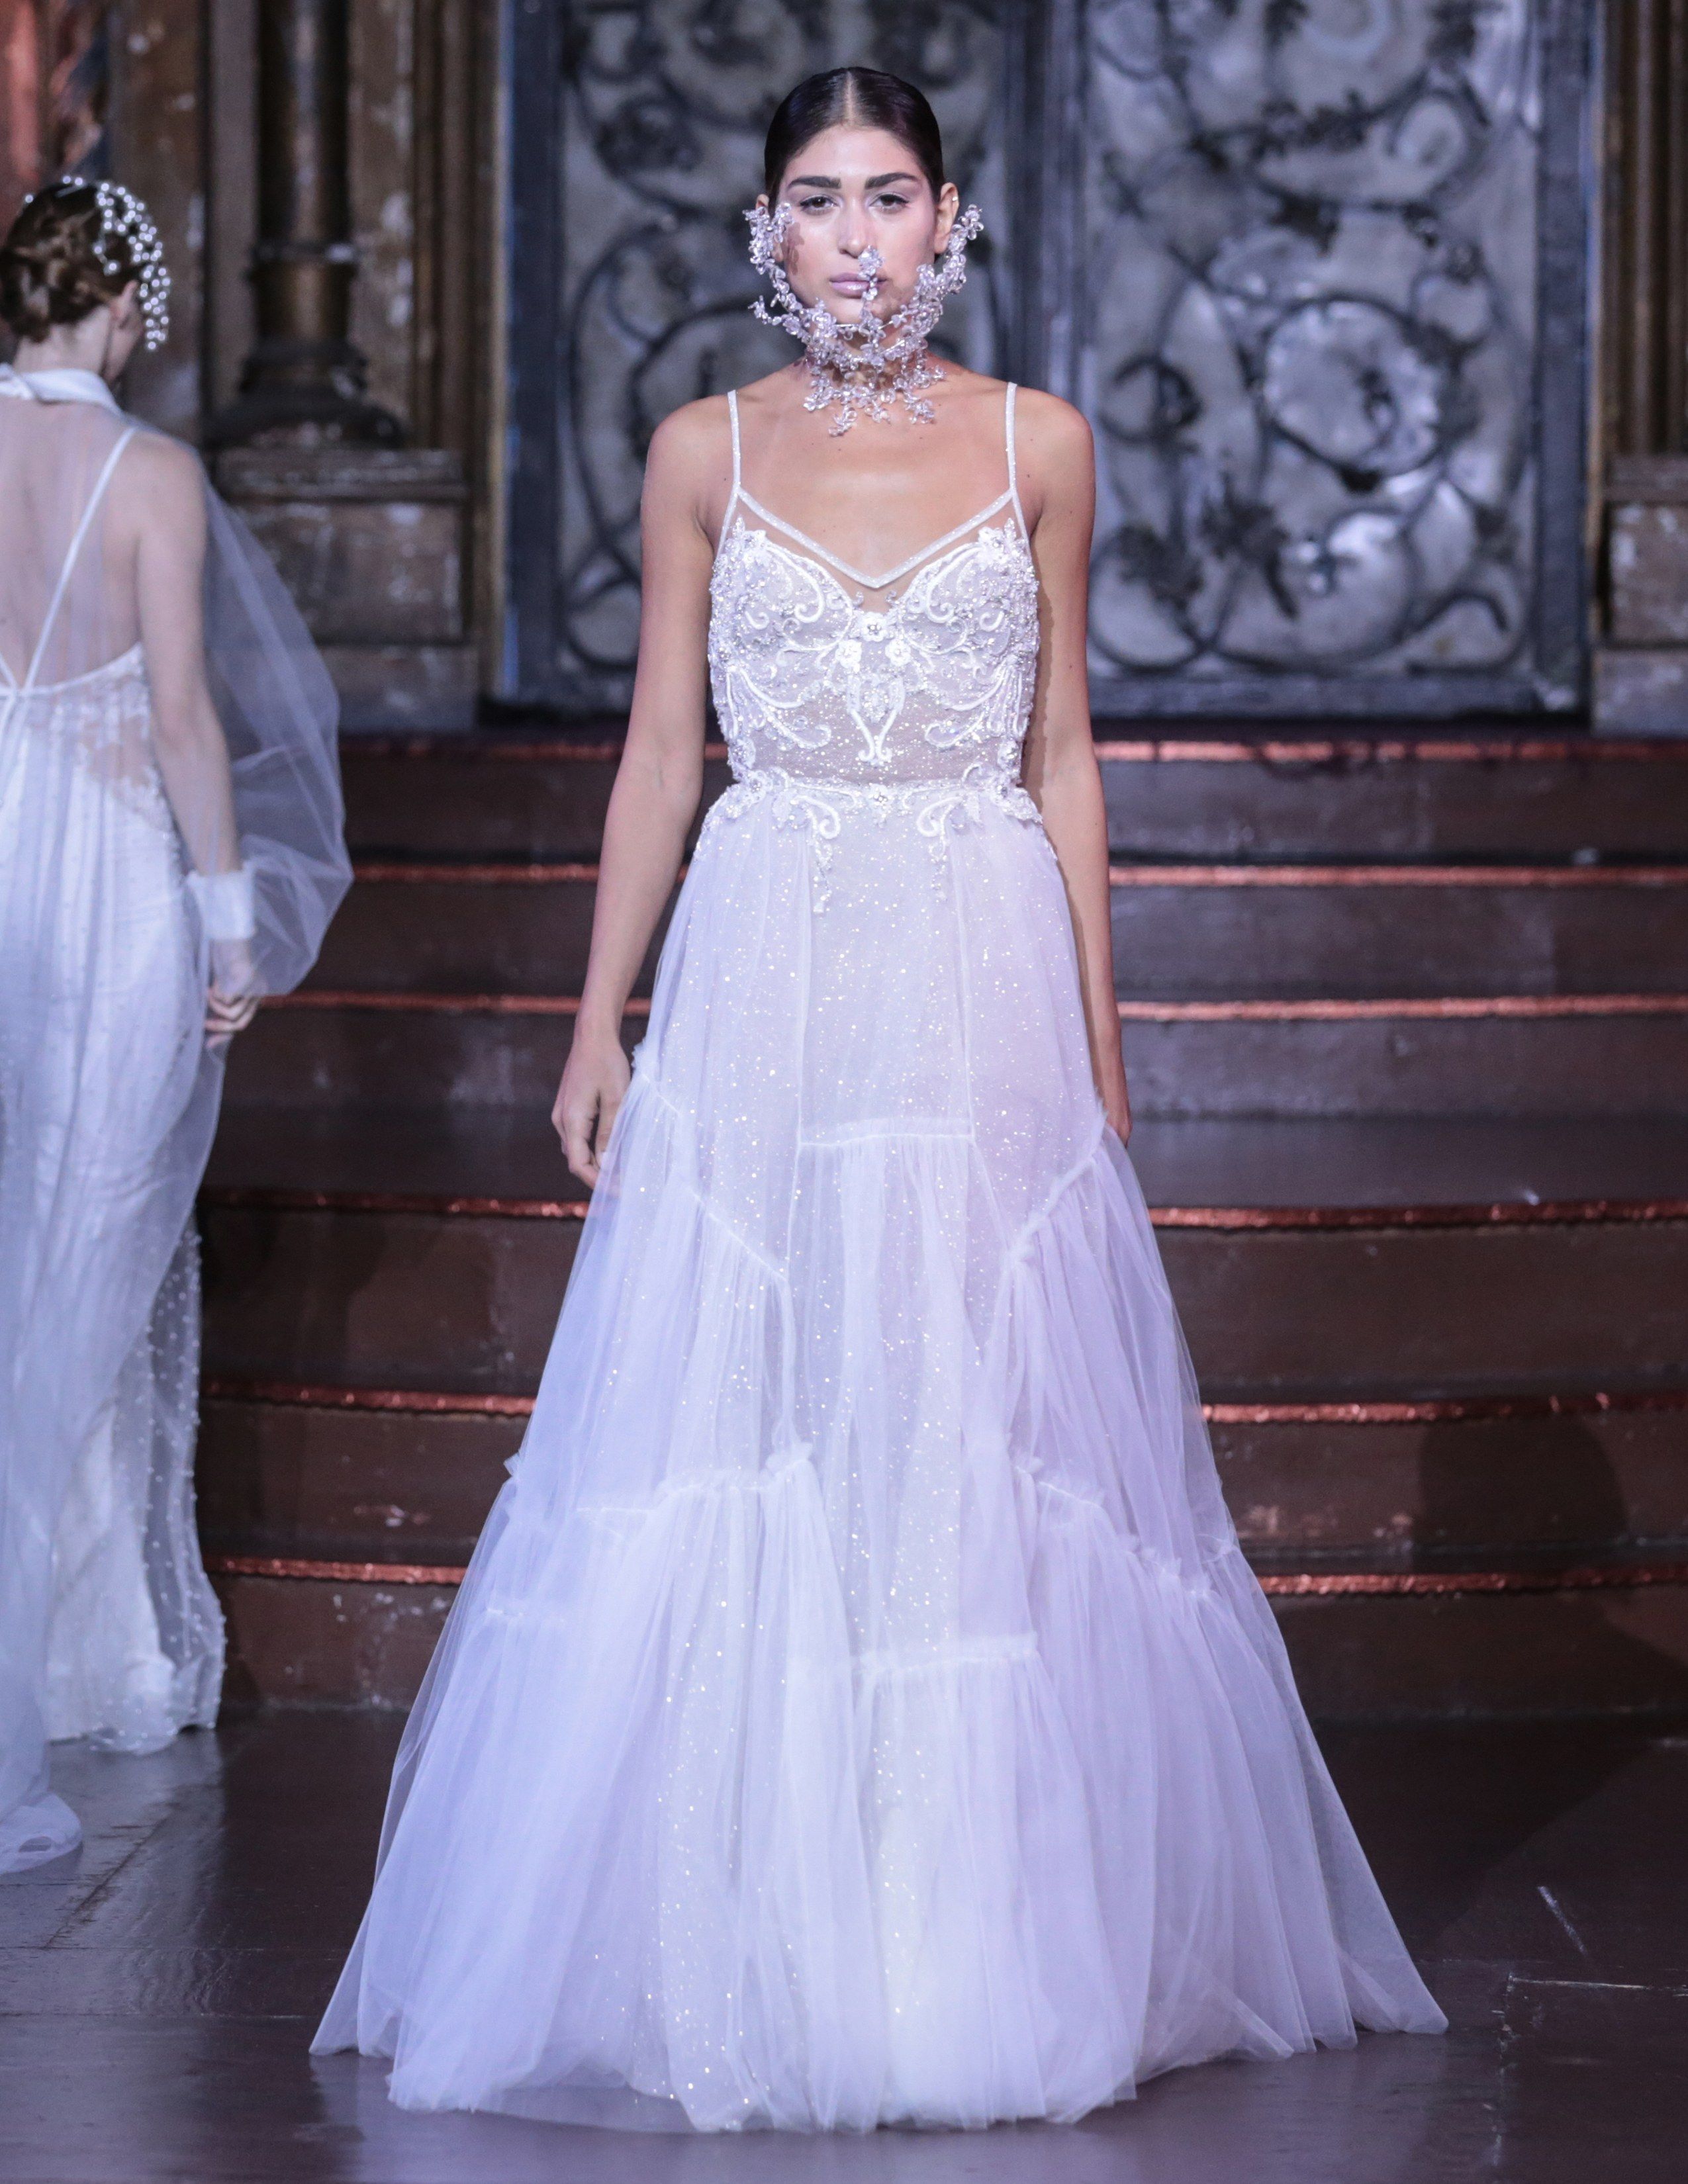 Dany mizrachi bridal u wedding dress collection fall brides